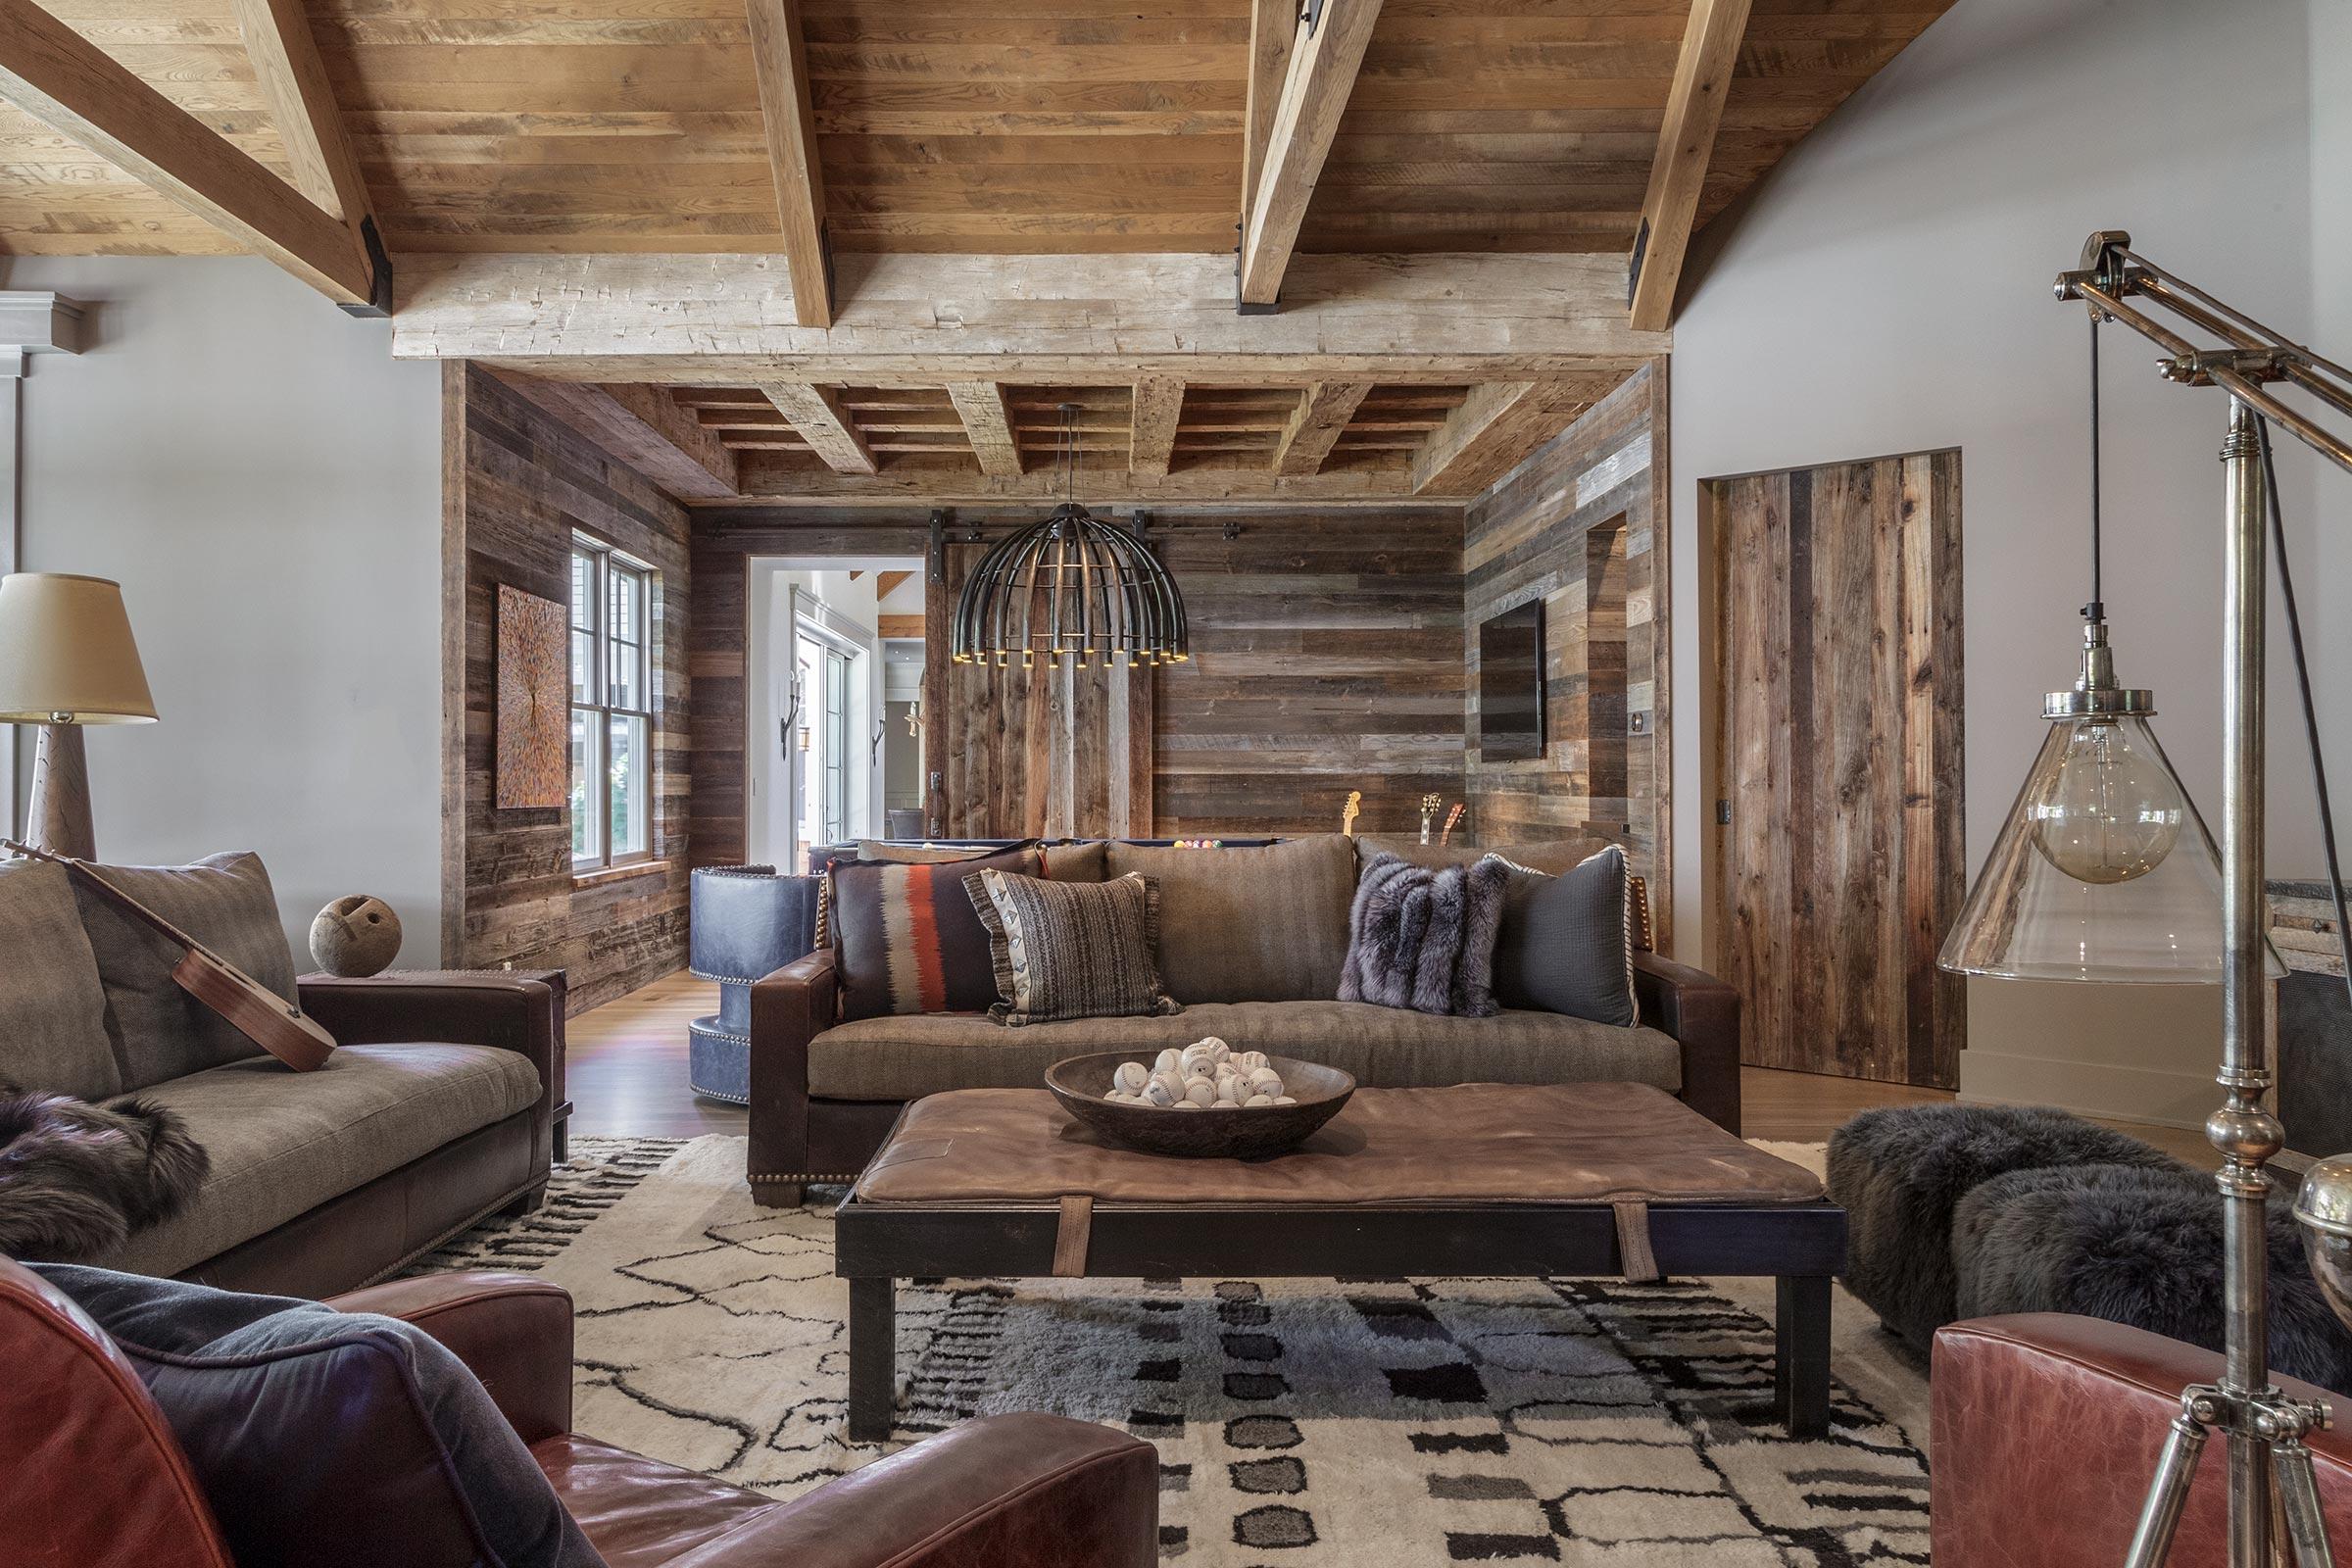 Diablo Shingle Style Lounge and Rec Room Buestad Construction